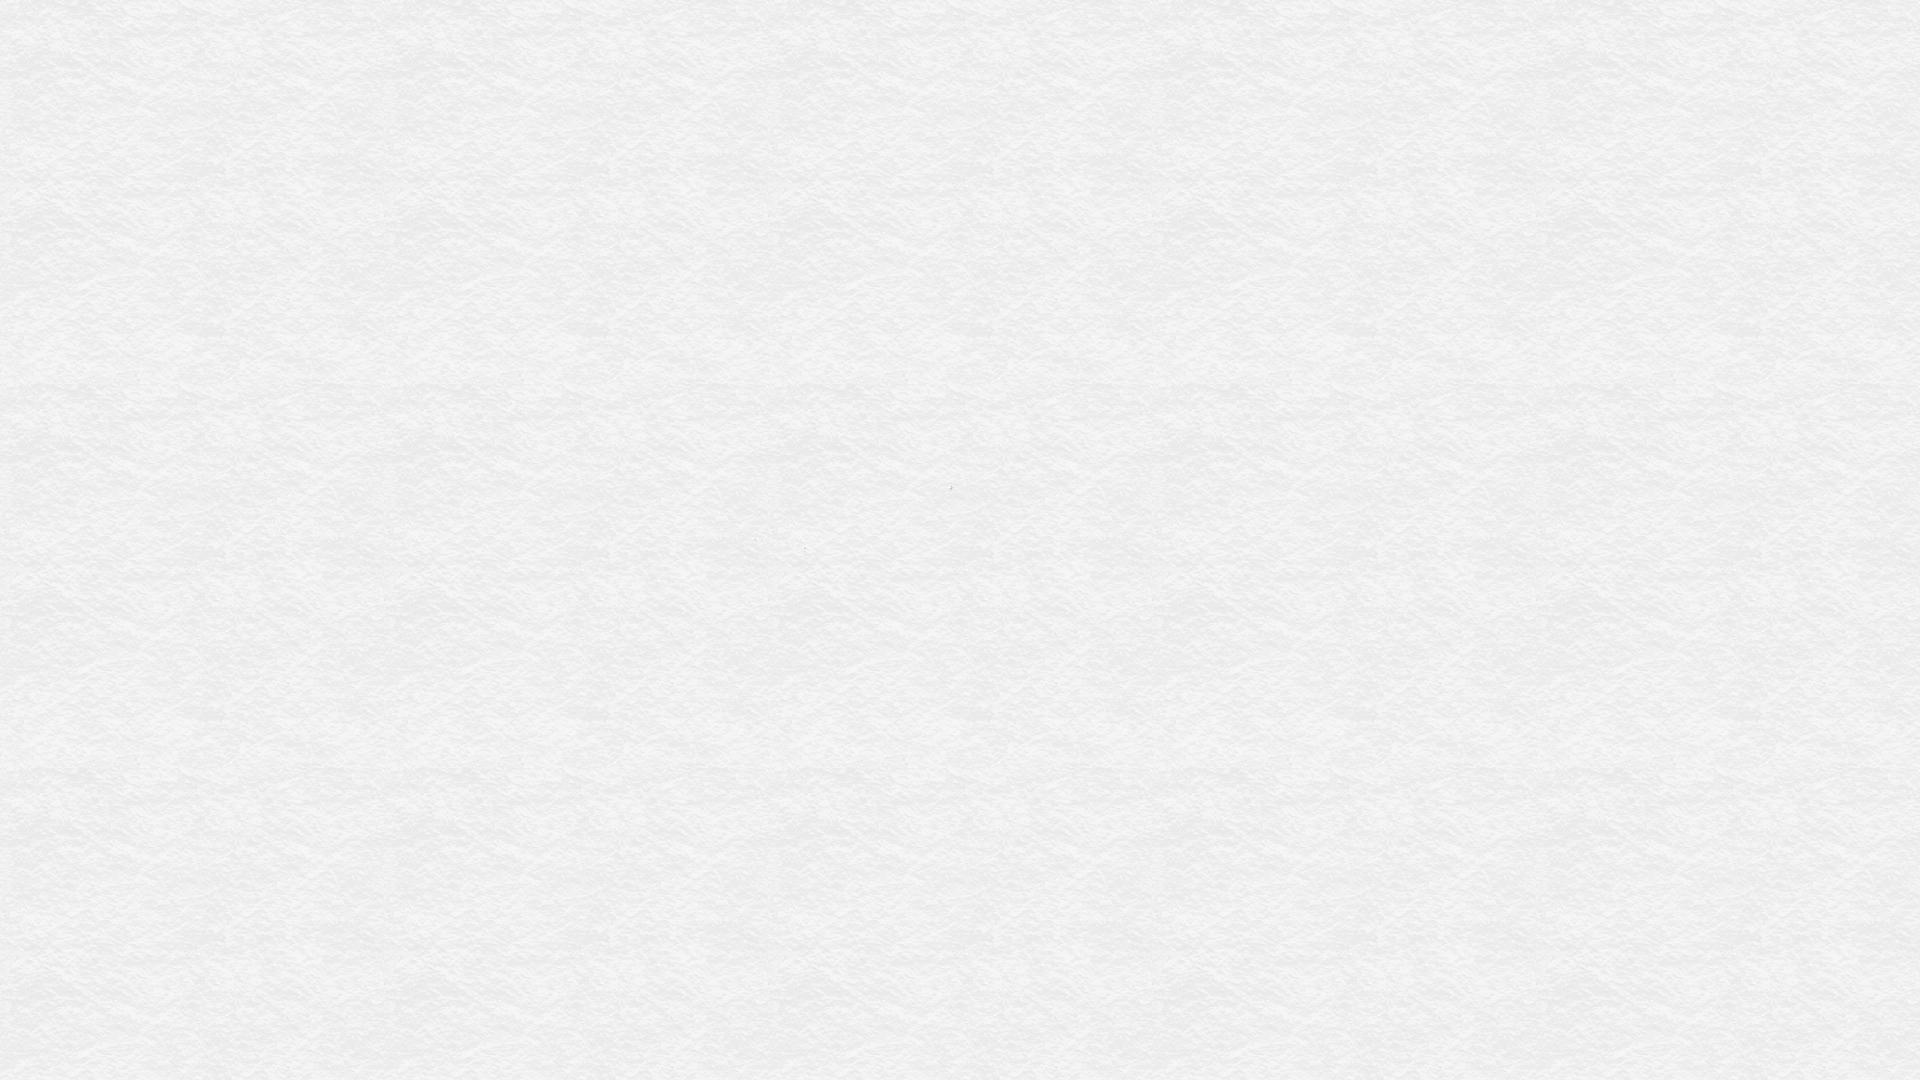 i paper 淄博报业传媒集团 地址:山东省淄博市张店区柳泉路212号 邮政编码:255006 新闻热线:0533-3188973 0533-3182736 技术支持: 潍坊北大青鸟华光照排有限公司.